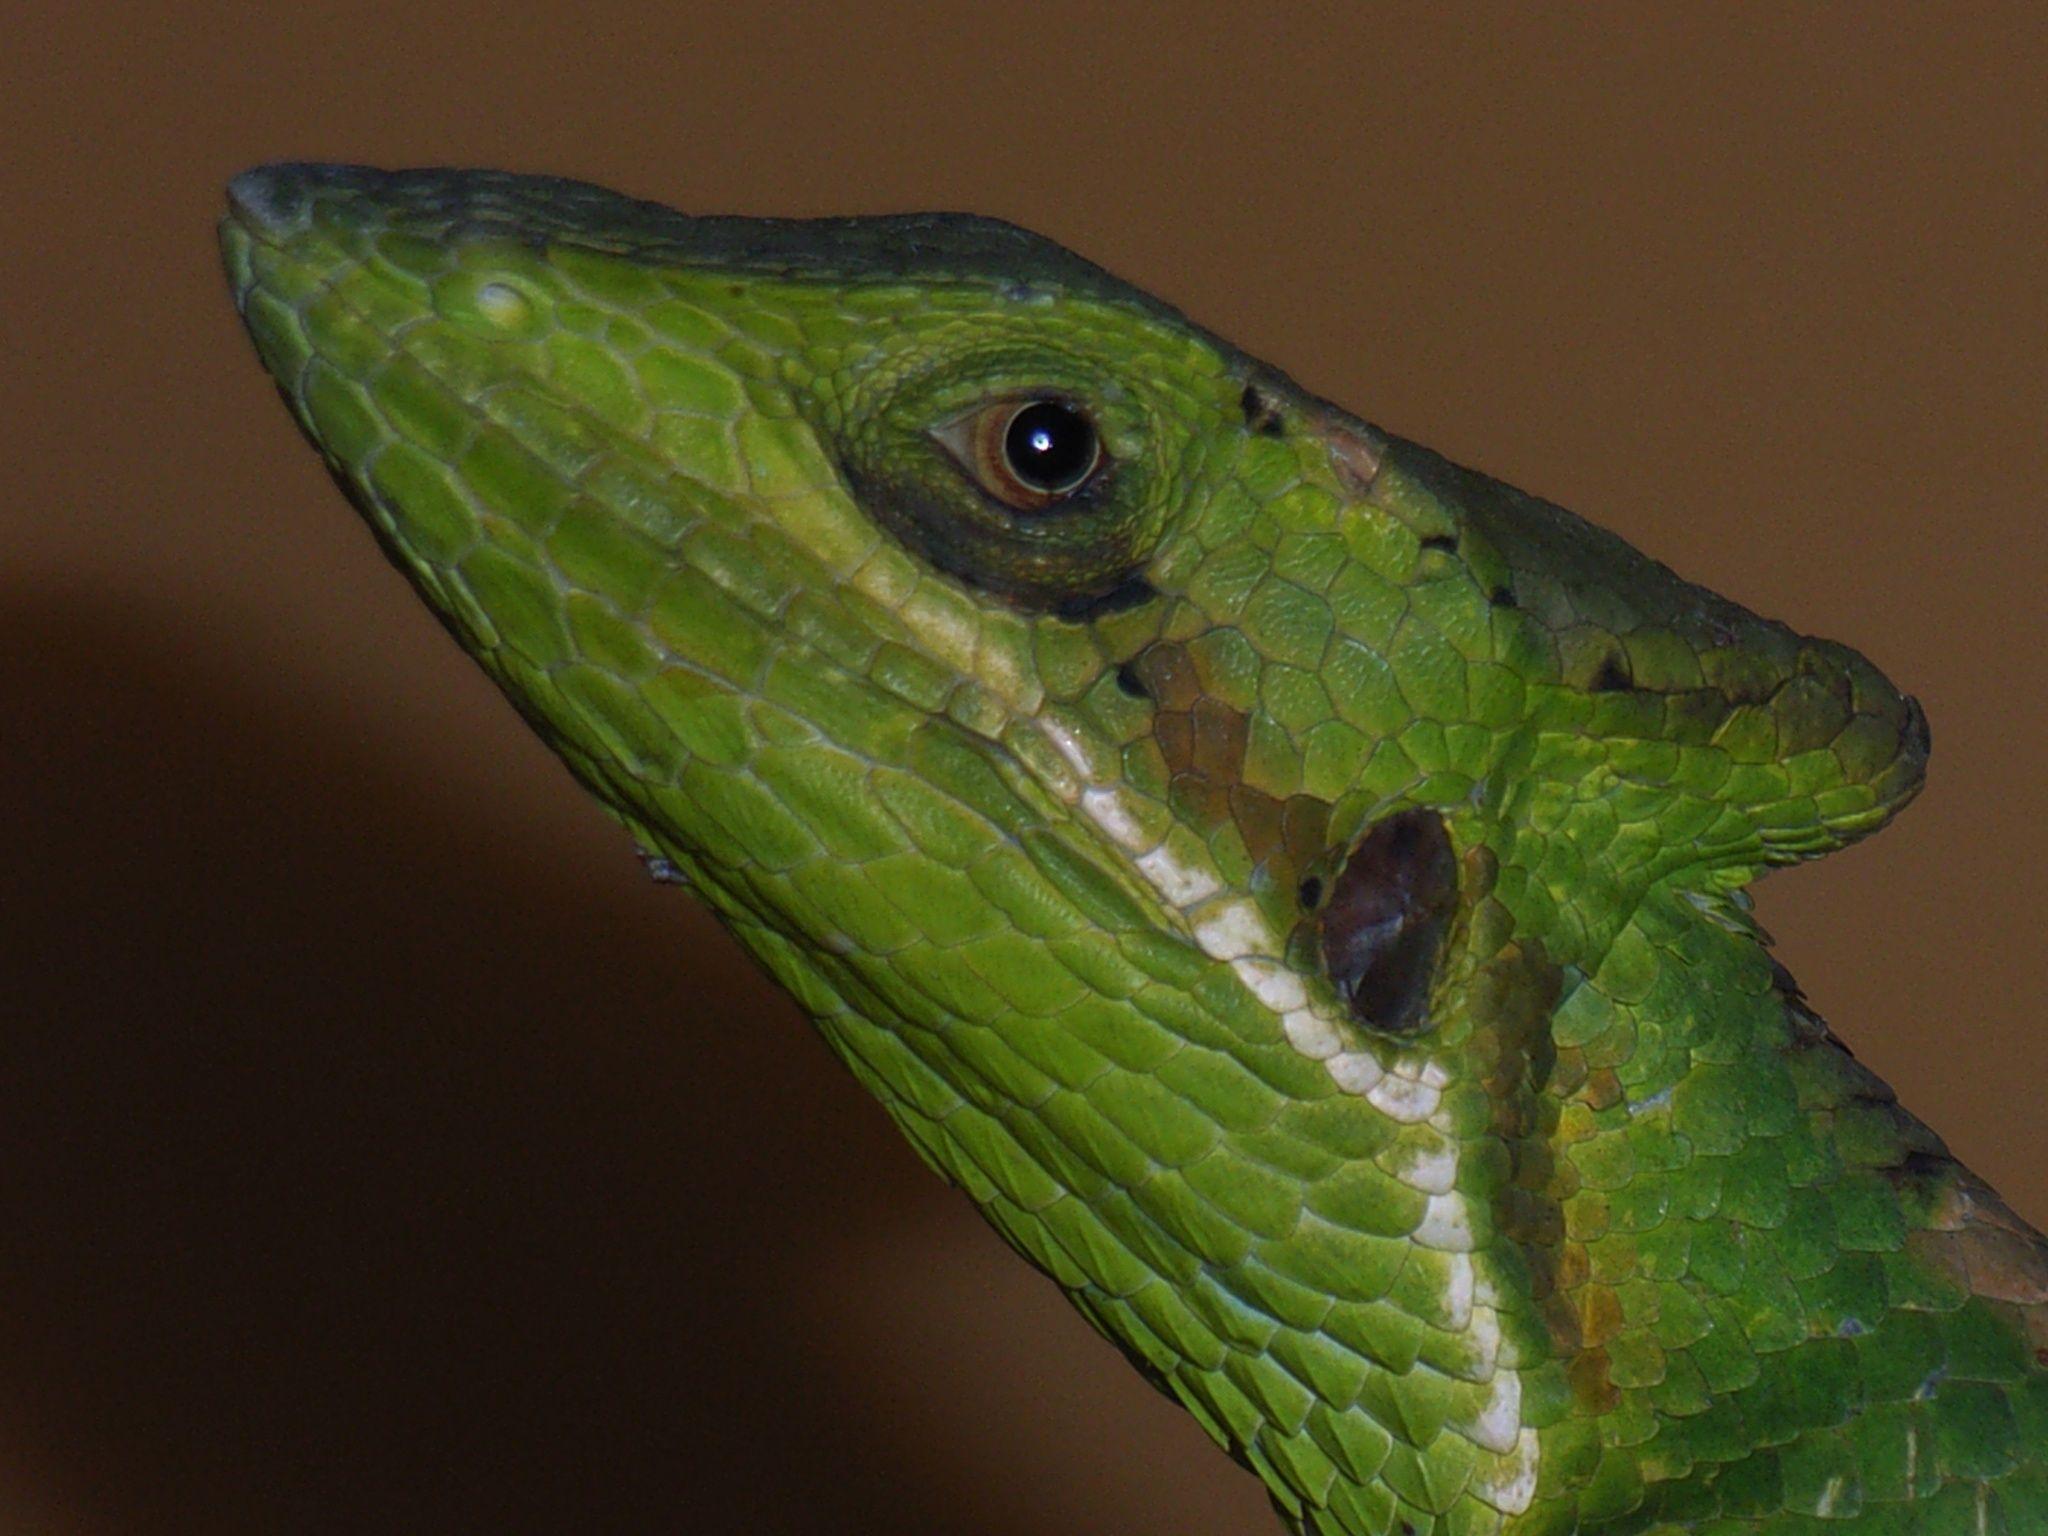 Kronenbasilisk Laemanctus longipes by Andrea Janitzki on